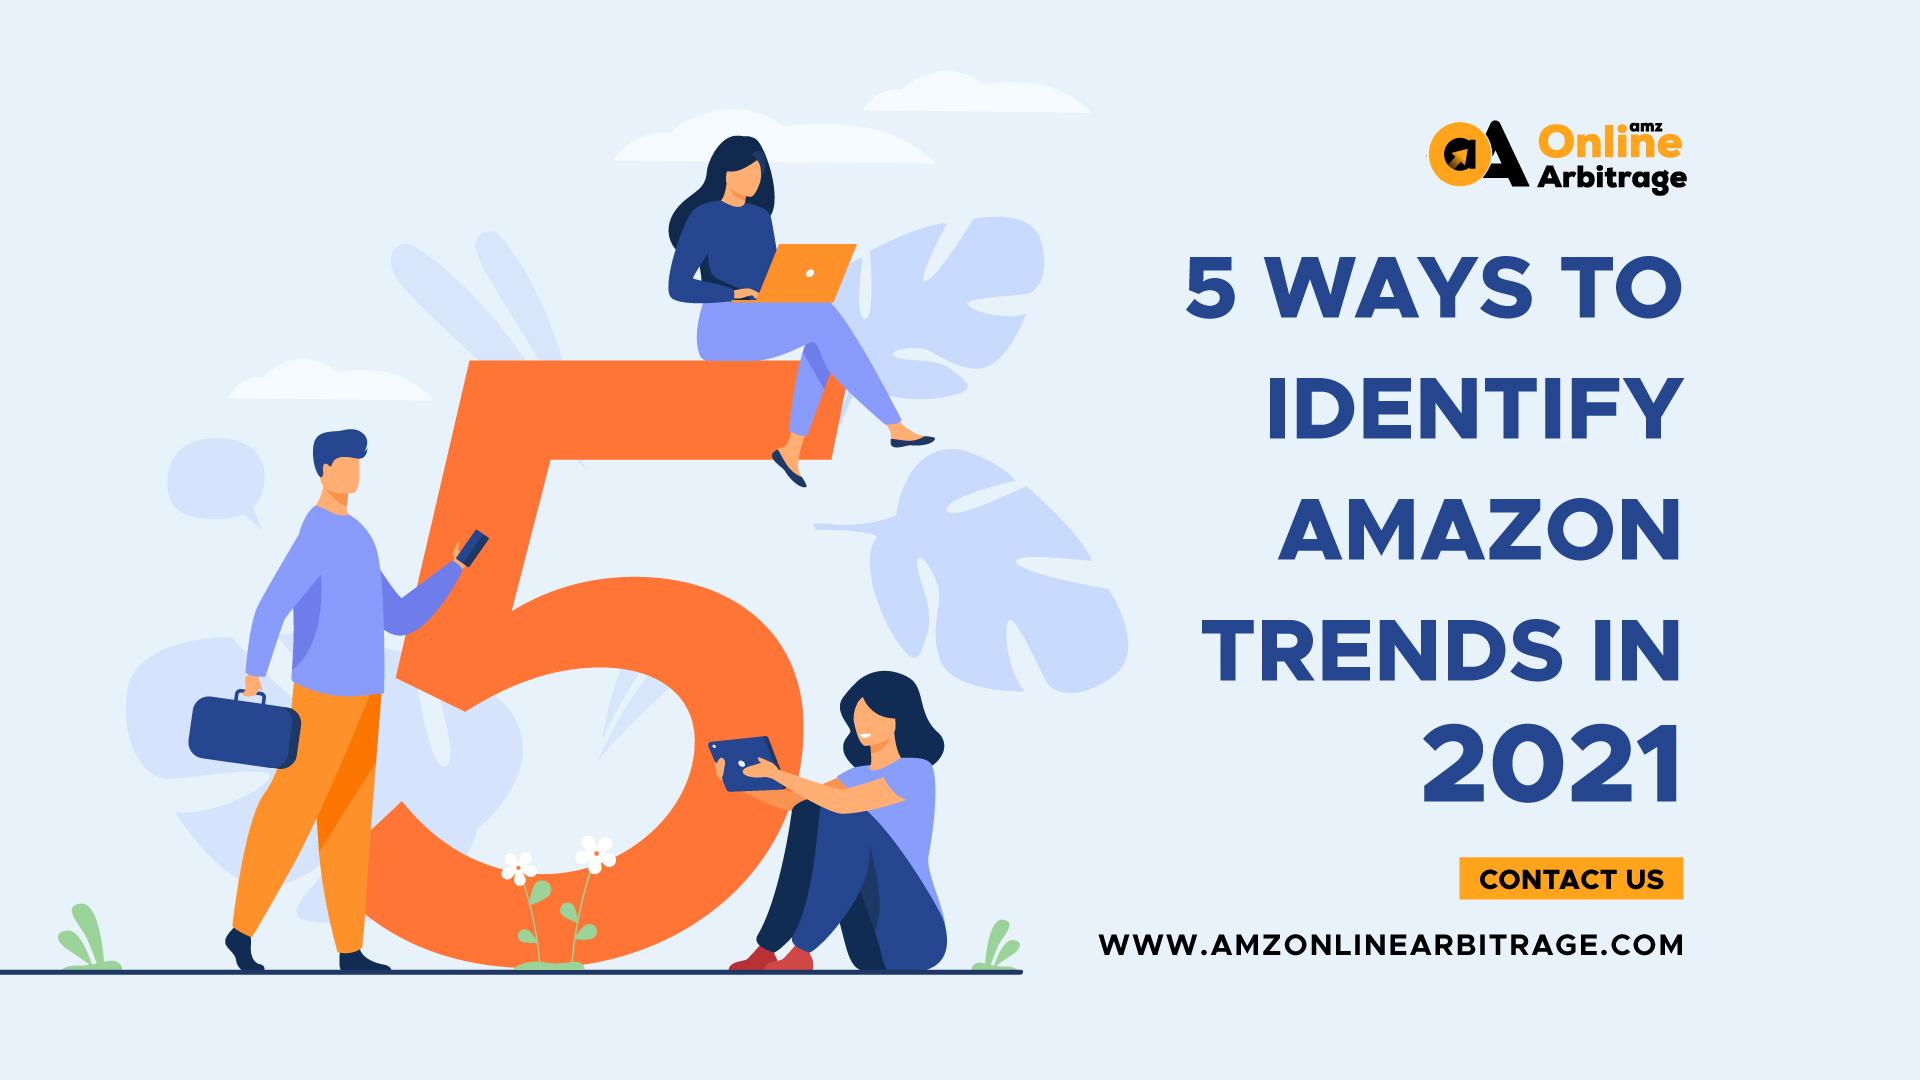 5 WAYS TO IDENTIFY AMAZON TRENDS IN 2021